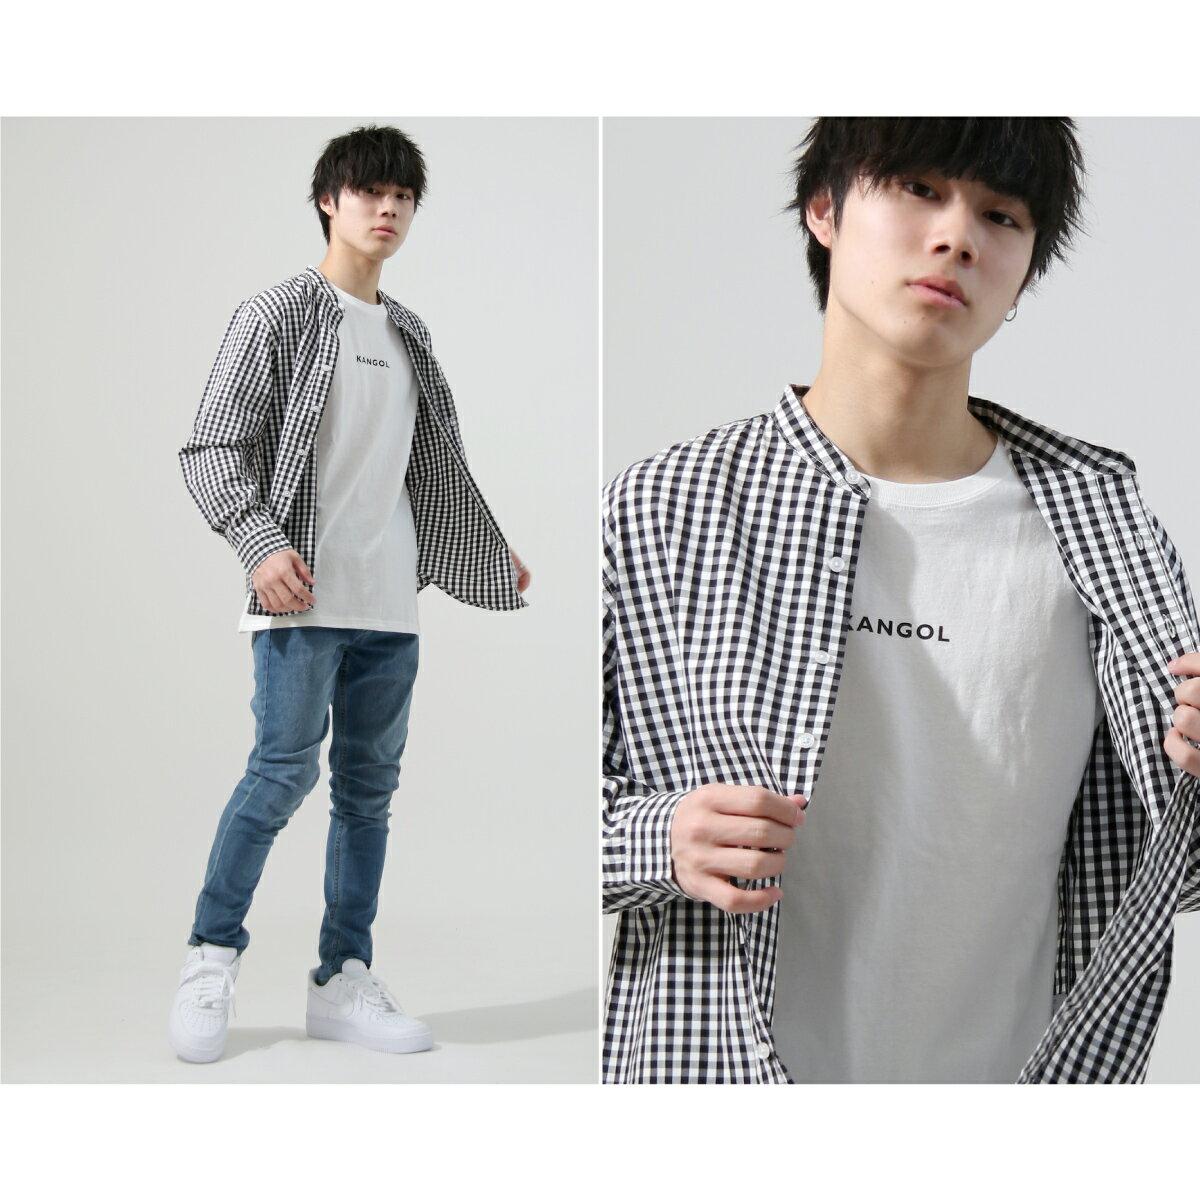 【New】KANGOL 立領襯衫 特注款 7